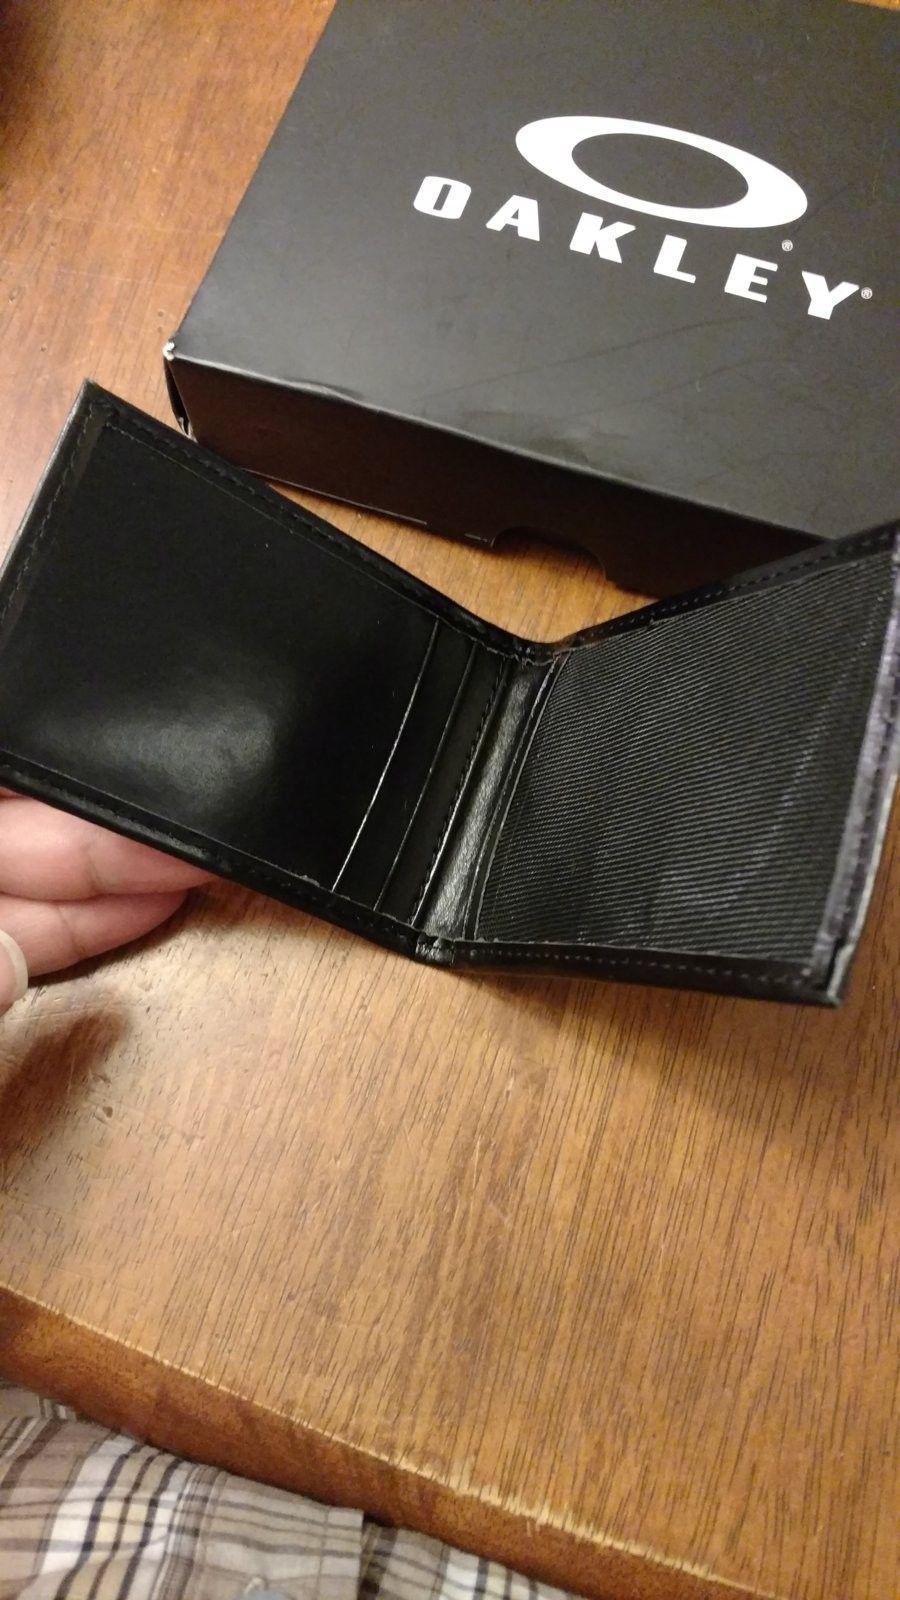 Oakley Wallet Credit Card Holder - IMG_20160628_184418363.jpg